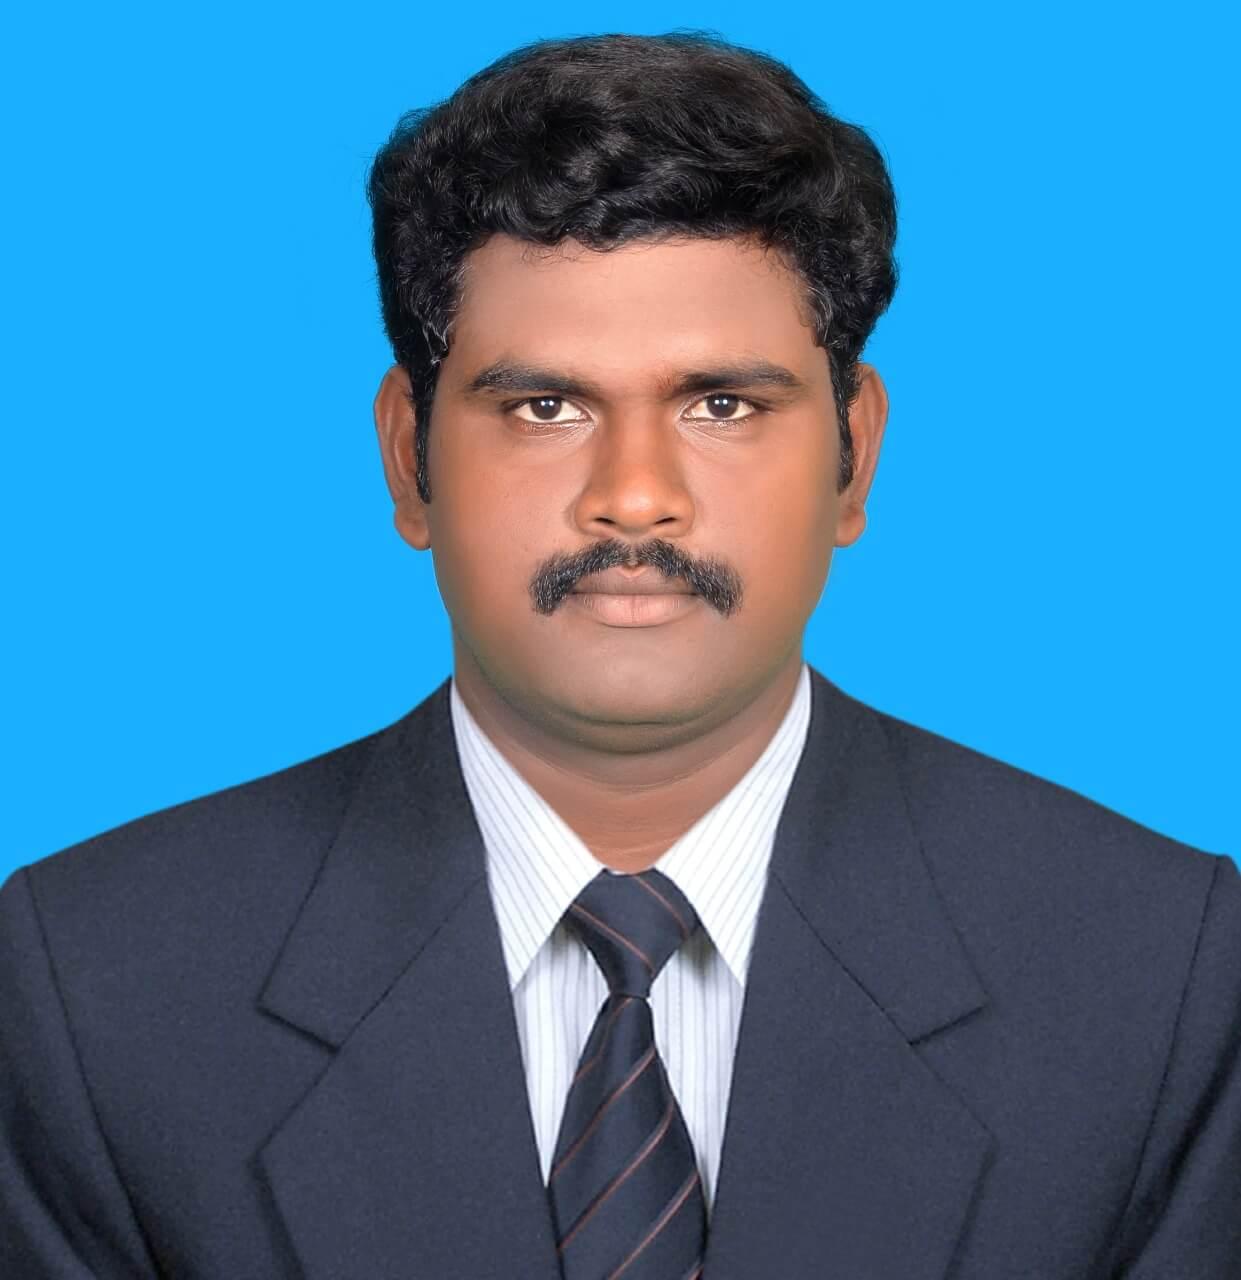 M.Thirumalaivasan